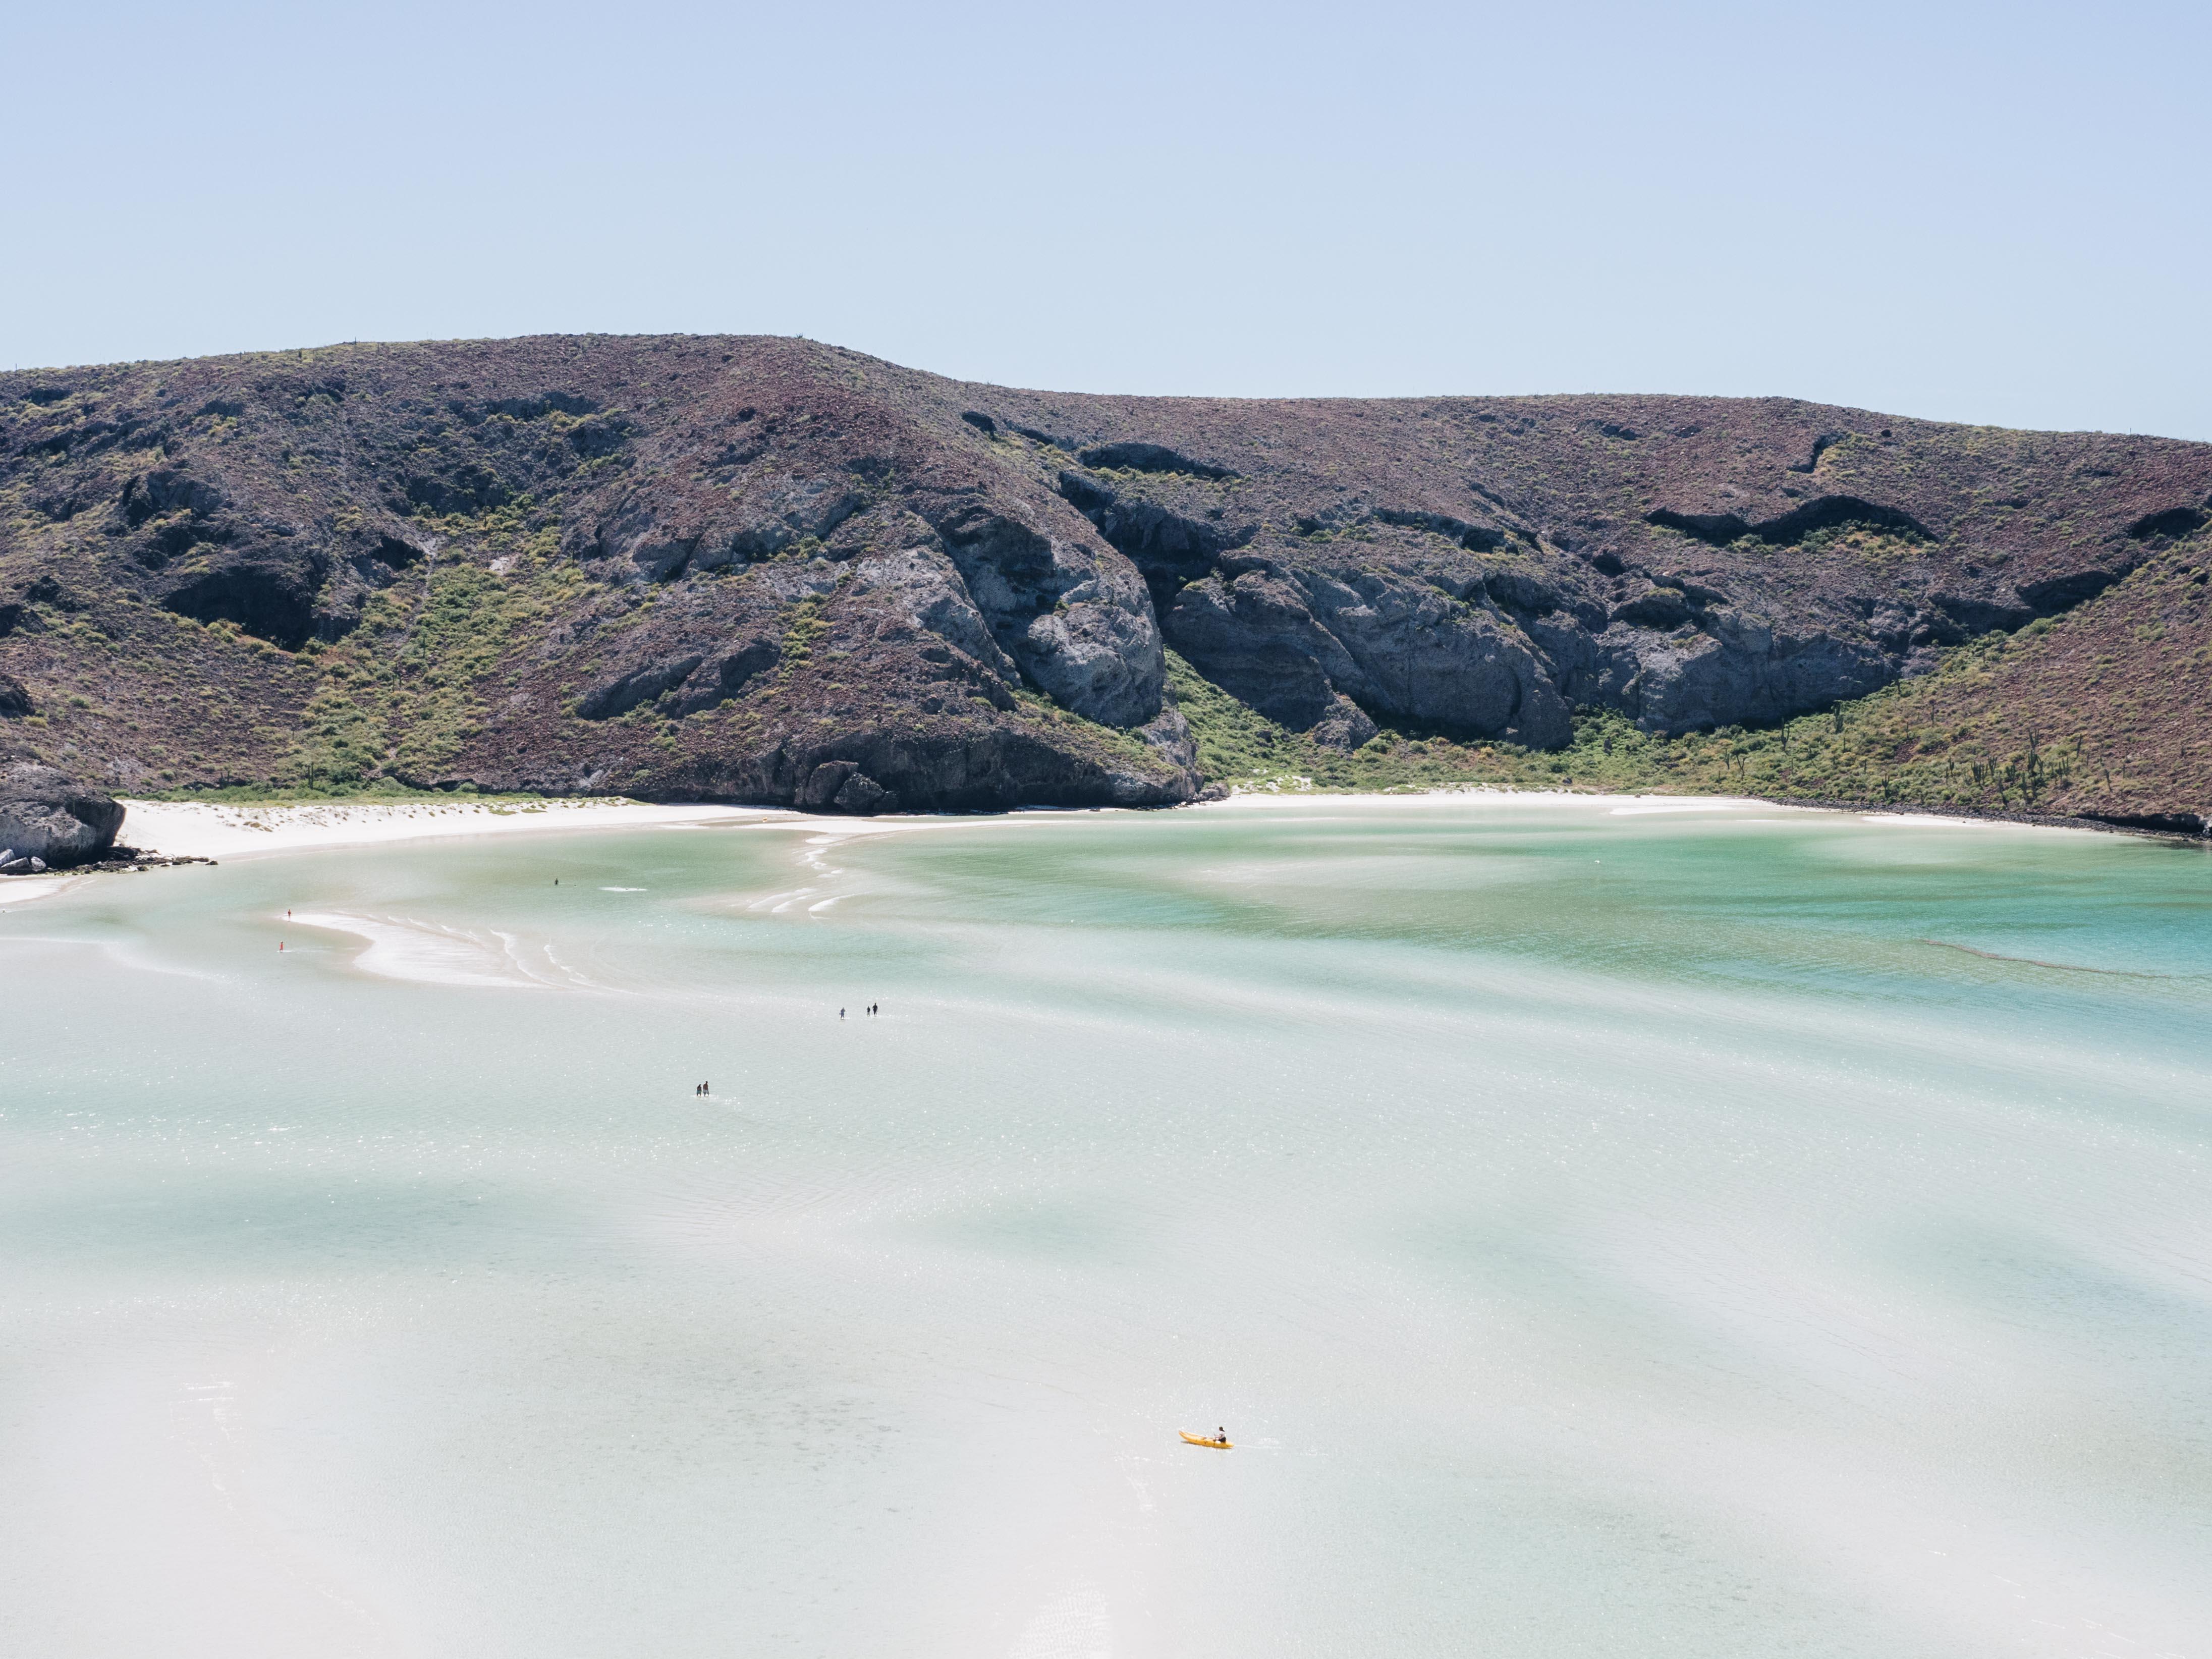 Image for blog article: La Paz- Baja California